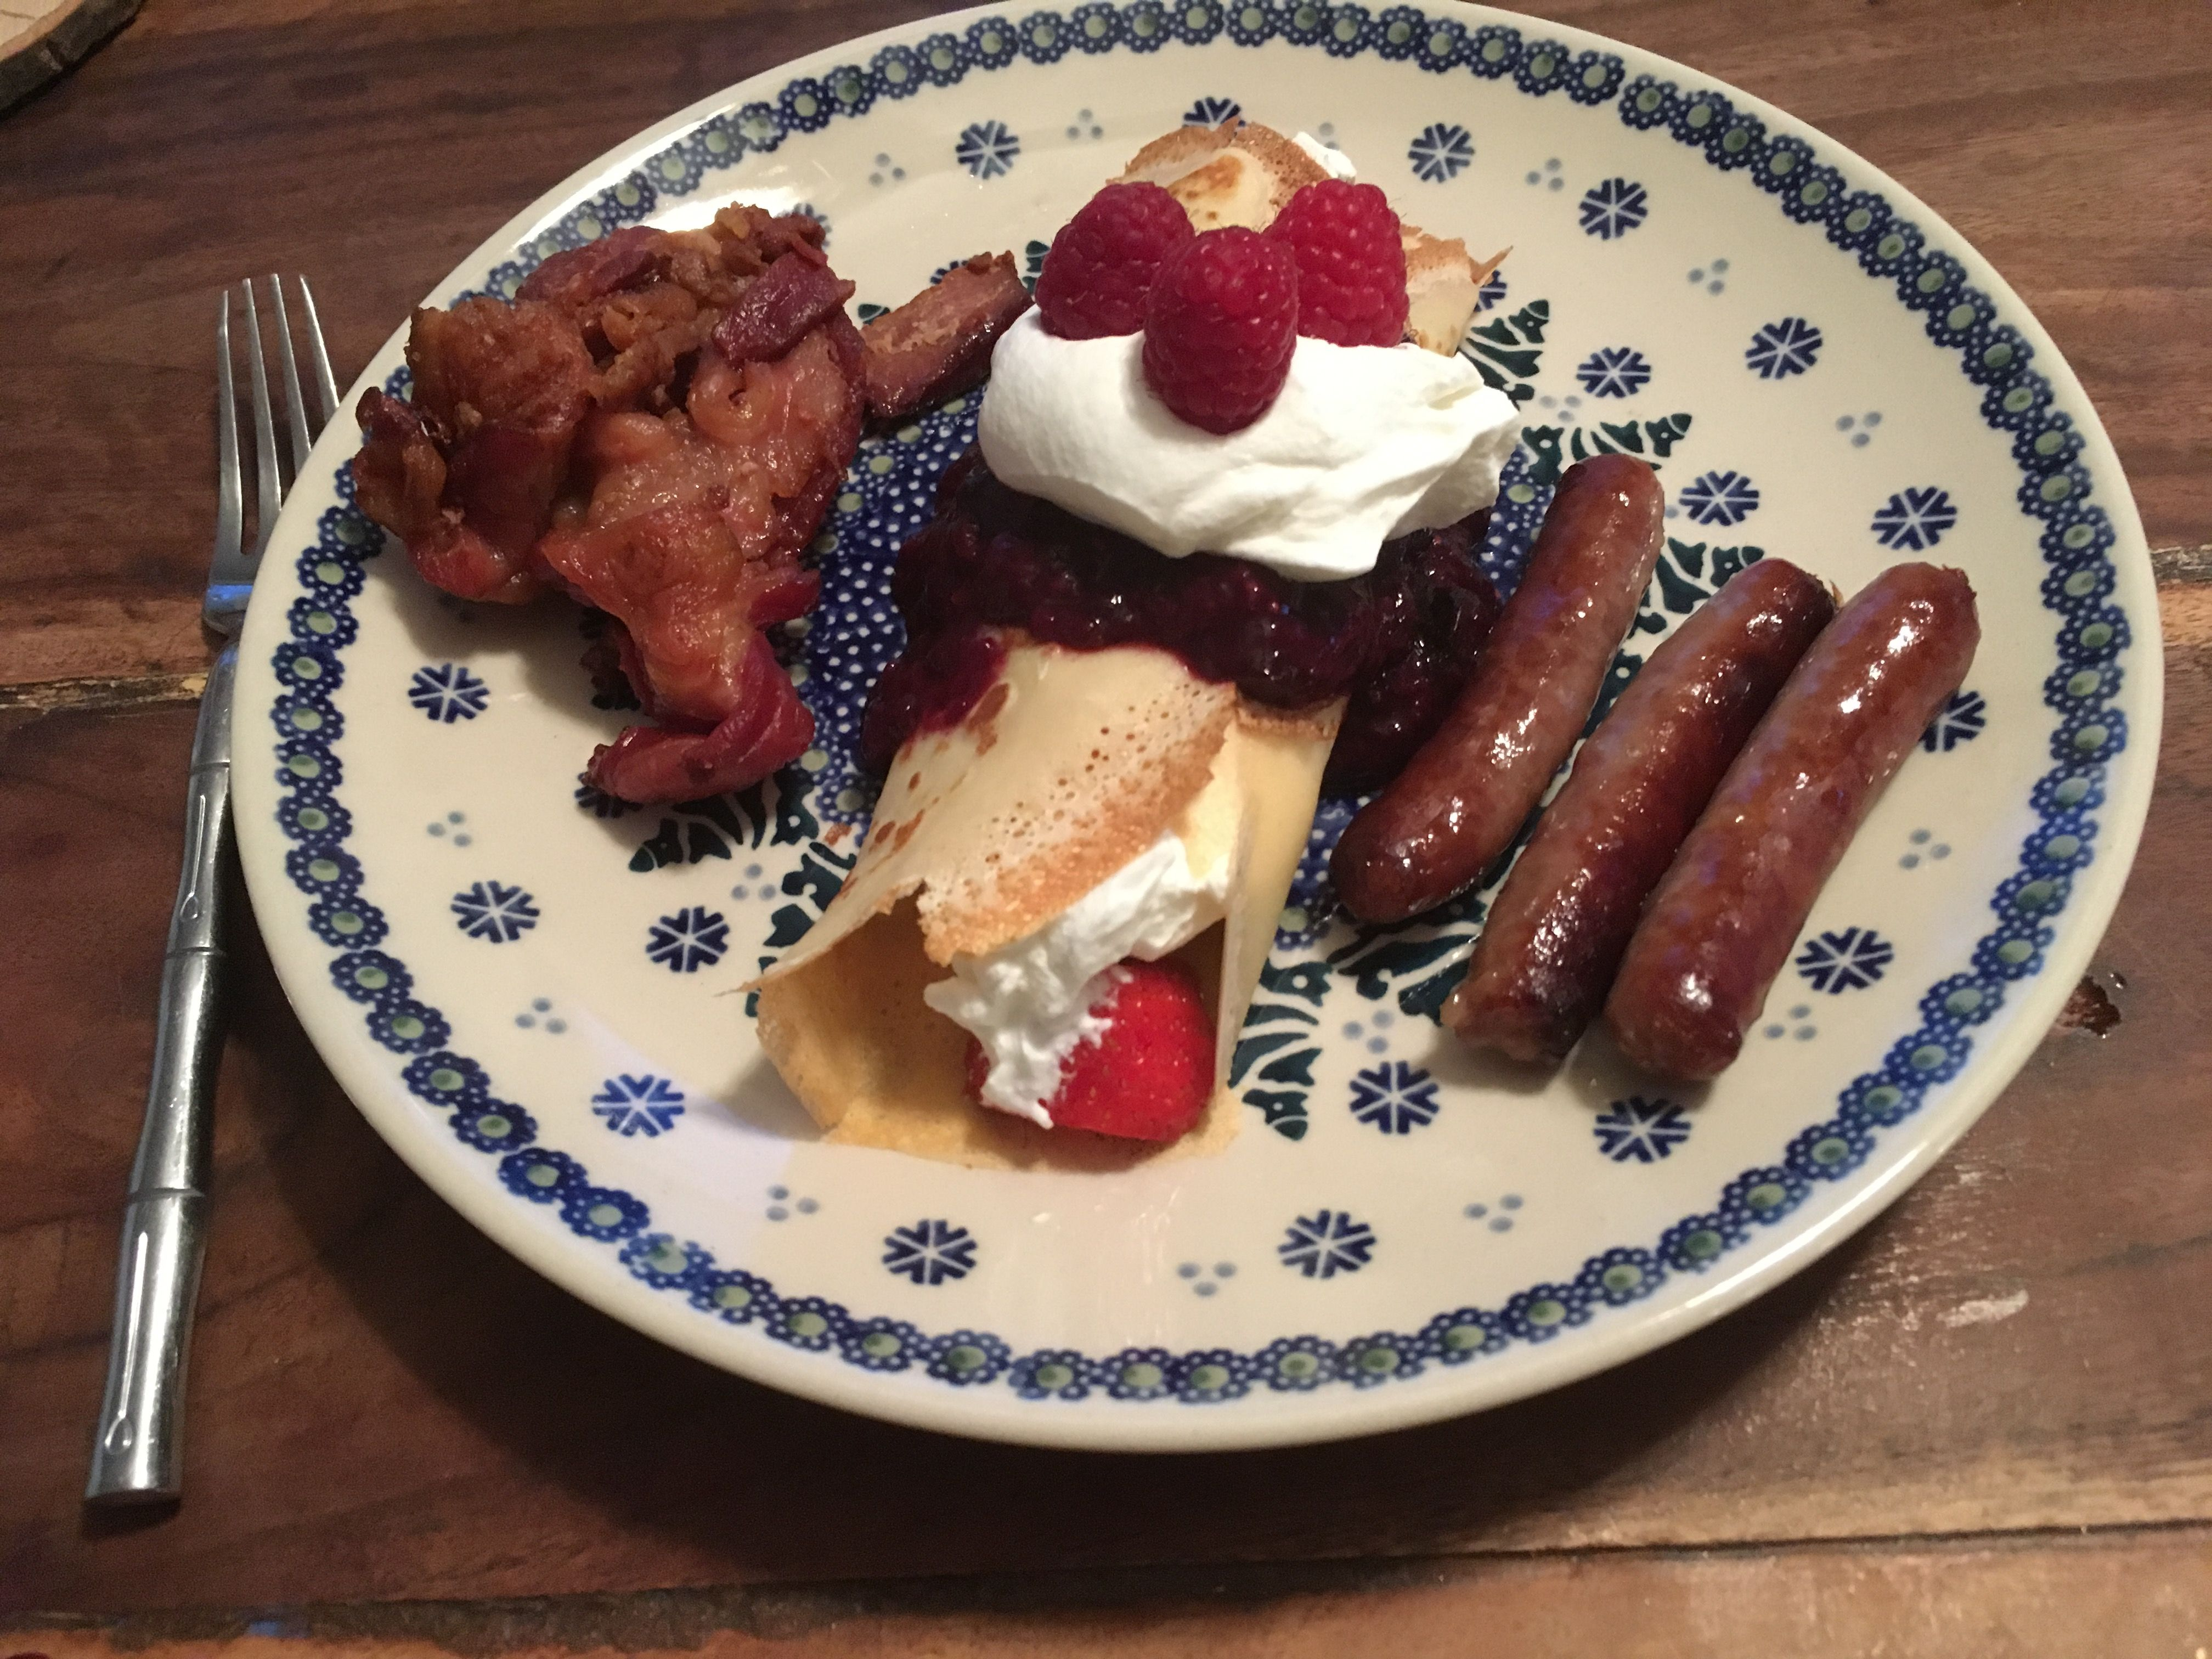 Pin by Phredd on Phredd's Stuff Food, Breakfast, Waffles